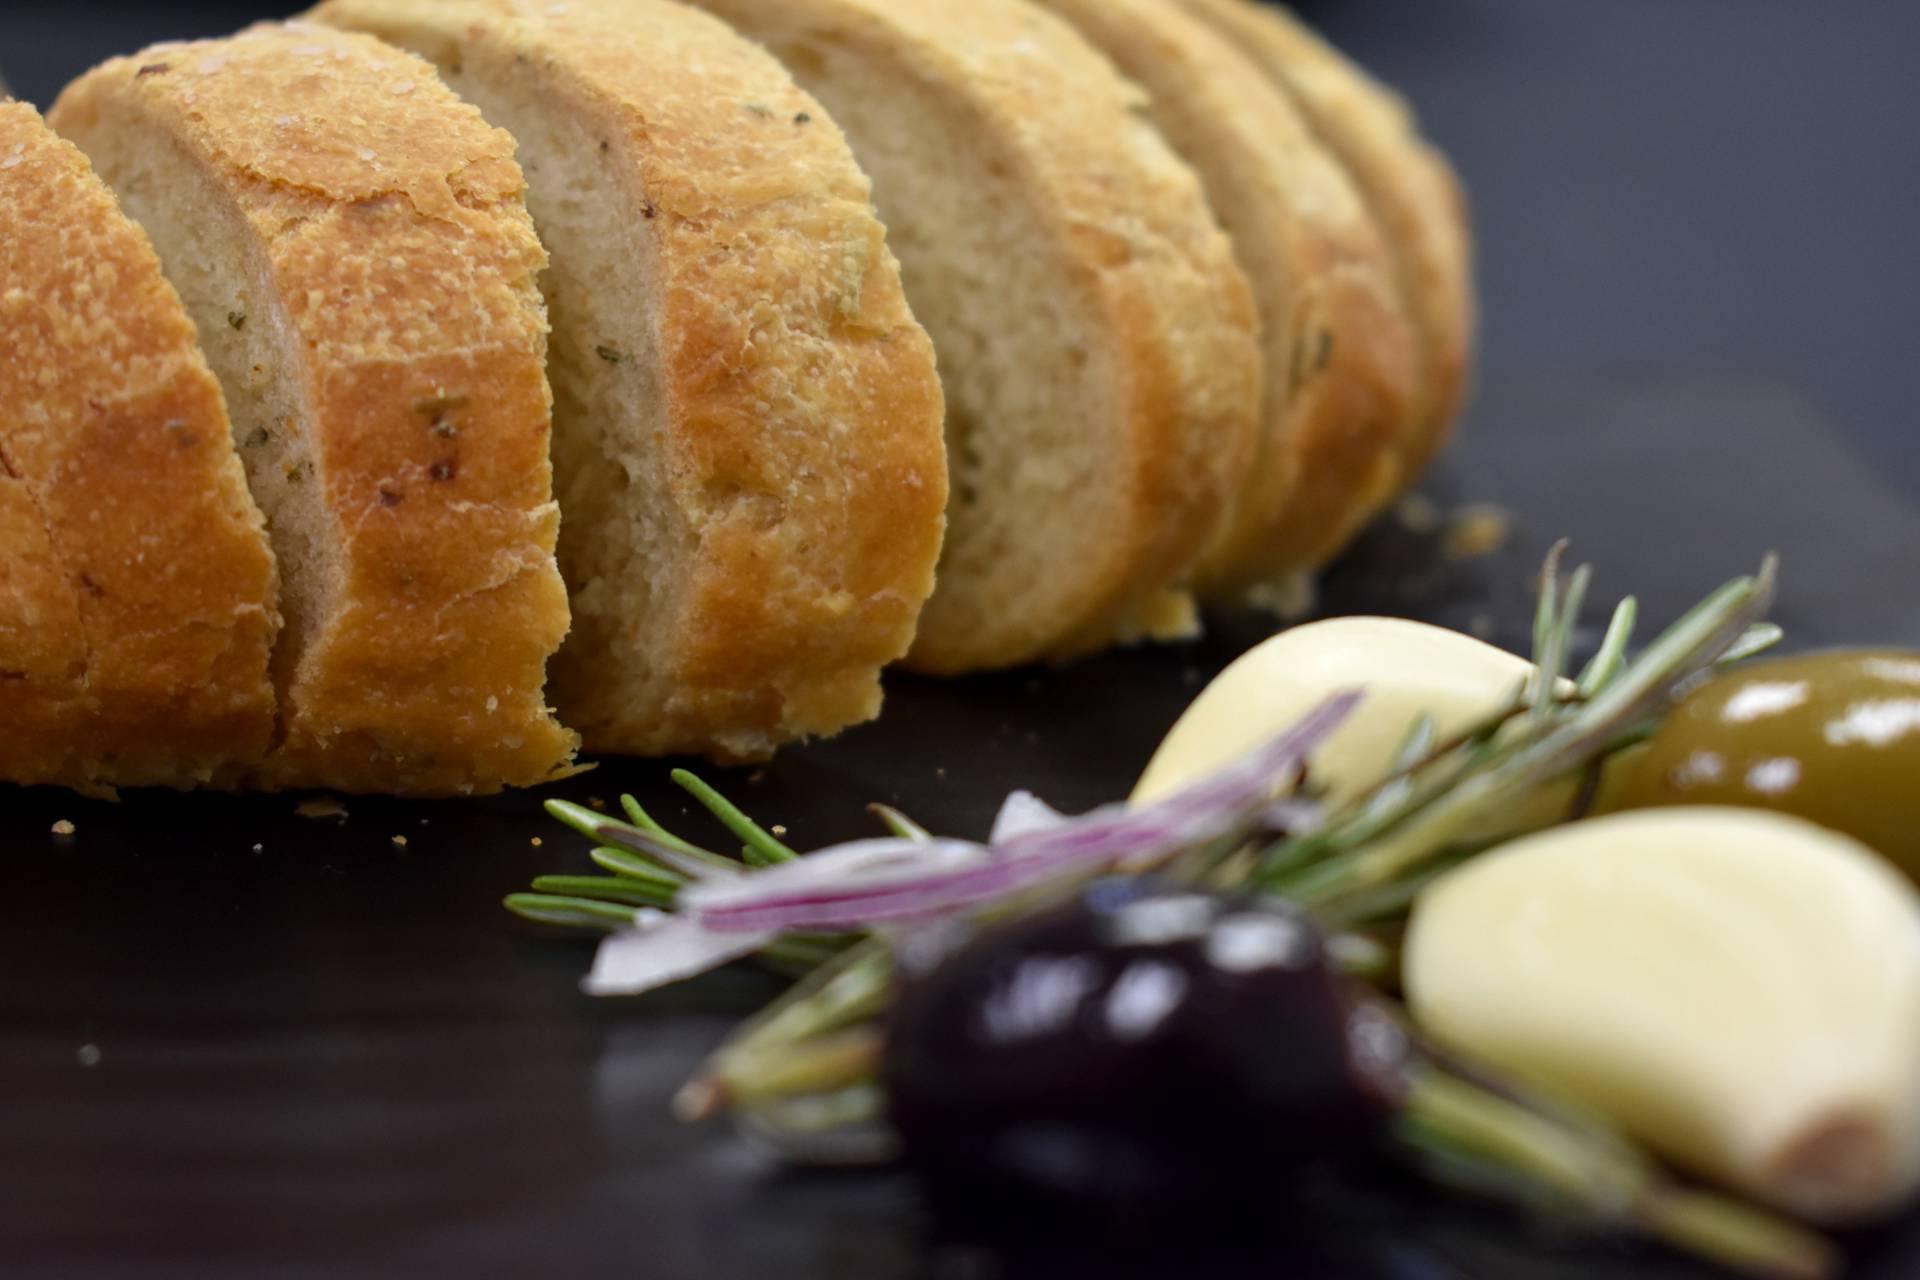 fresh bread bakery